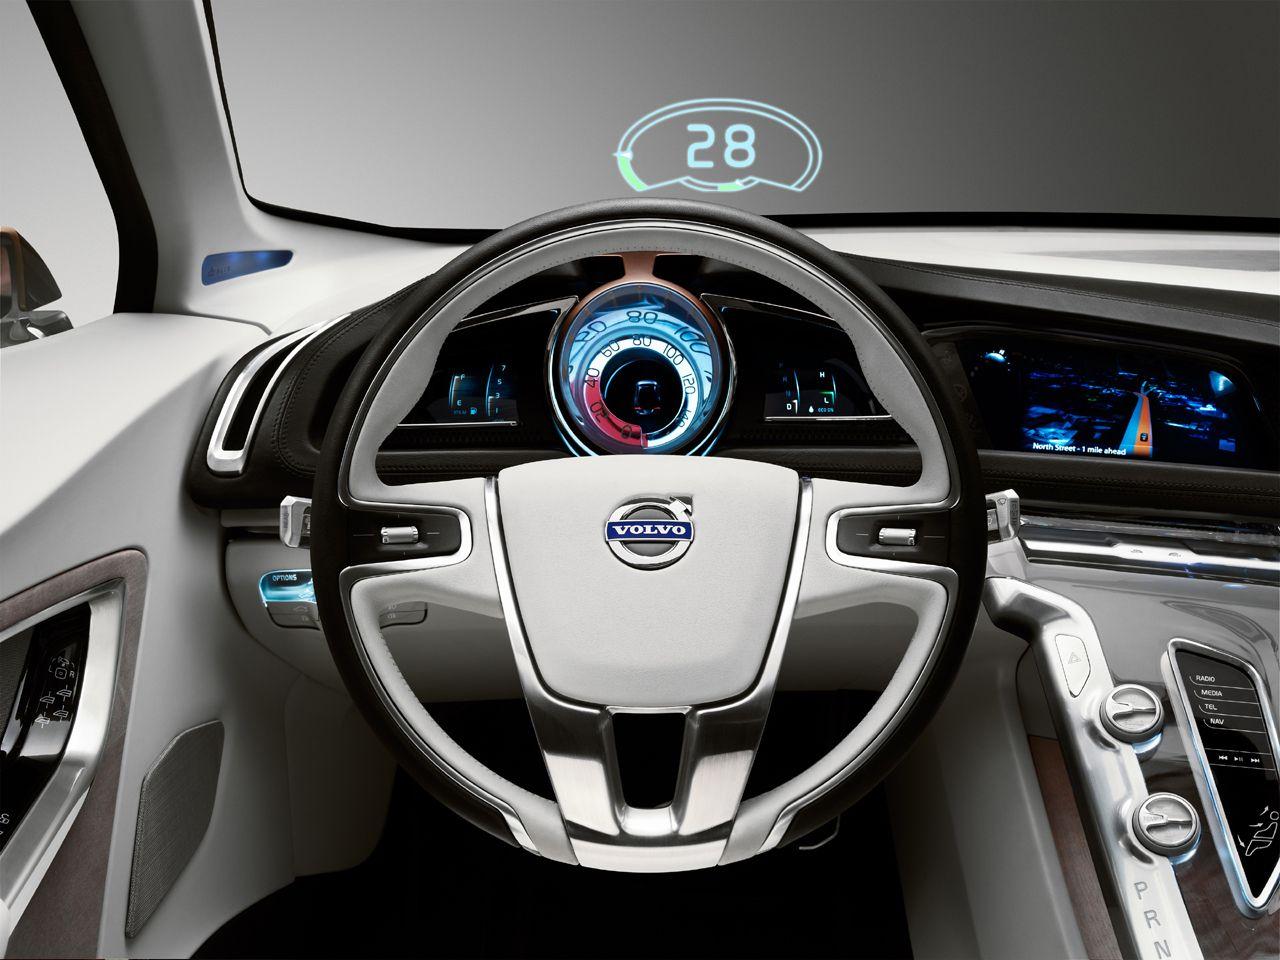 Concept Hud Google Search 자동차 자동차내부 디자인